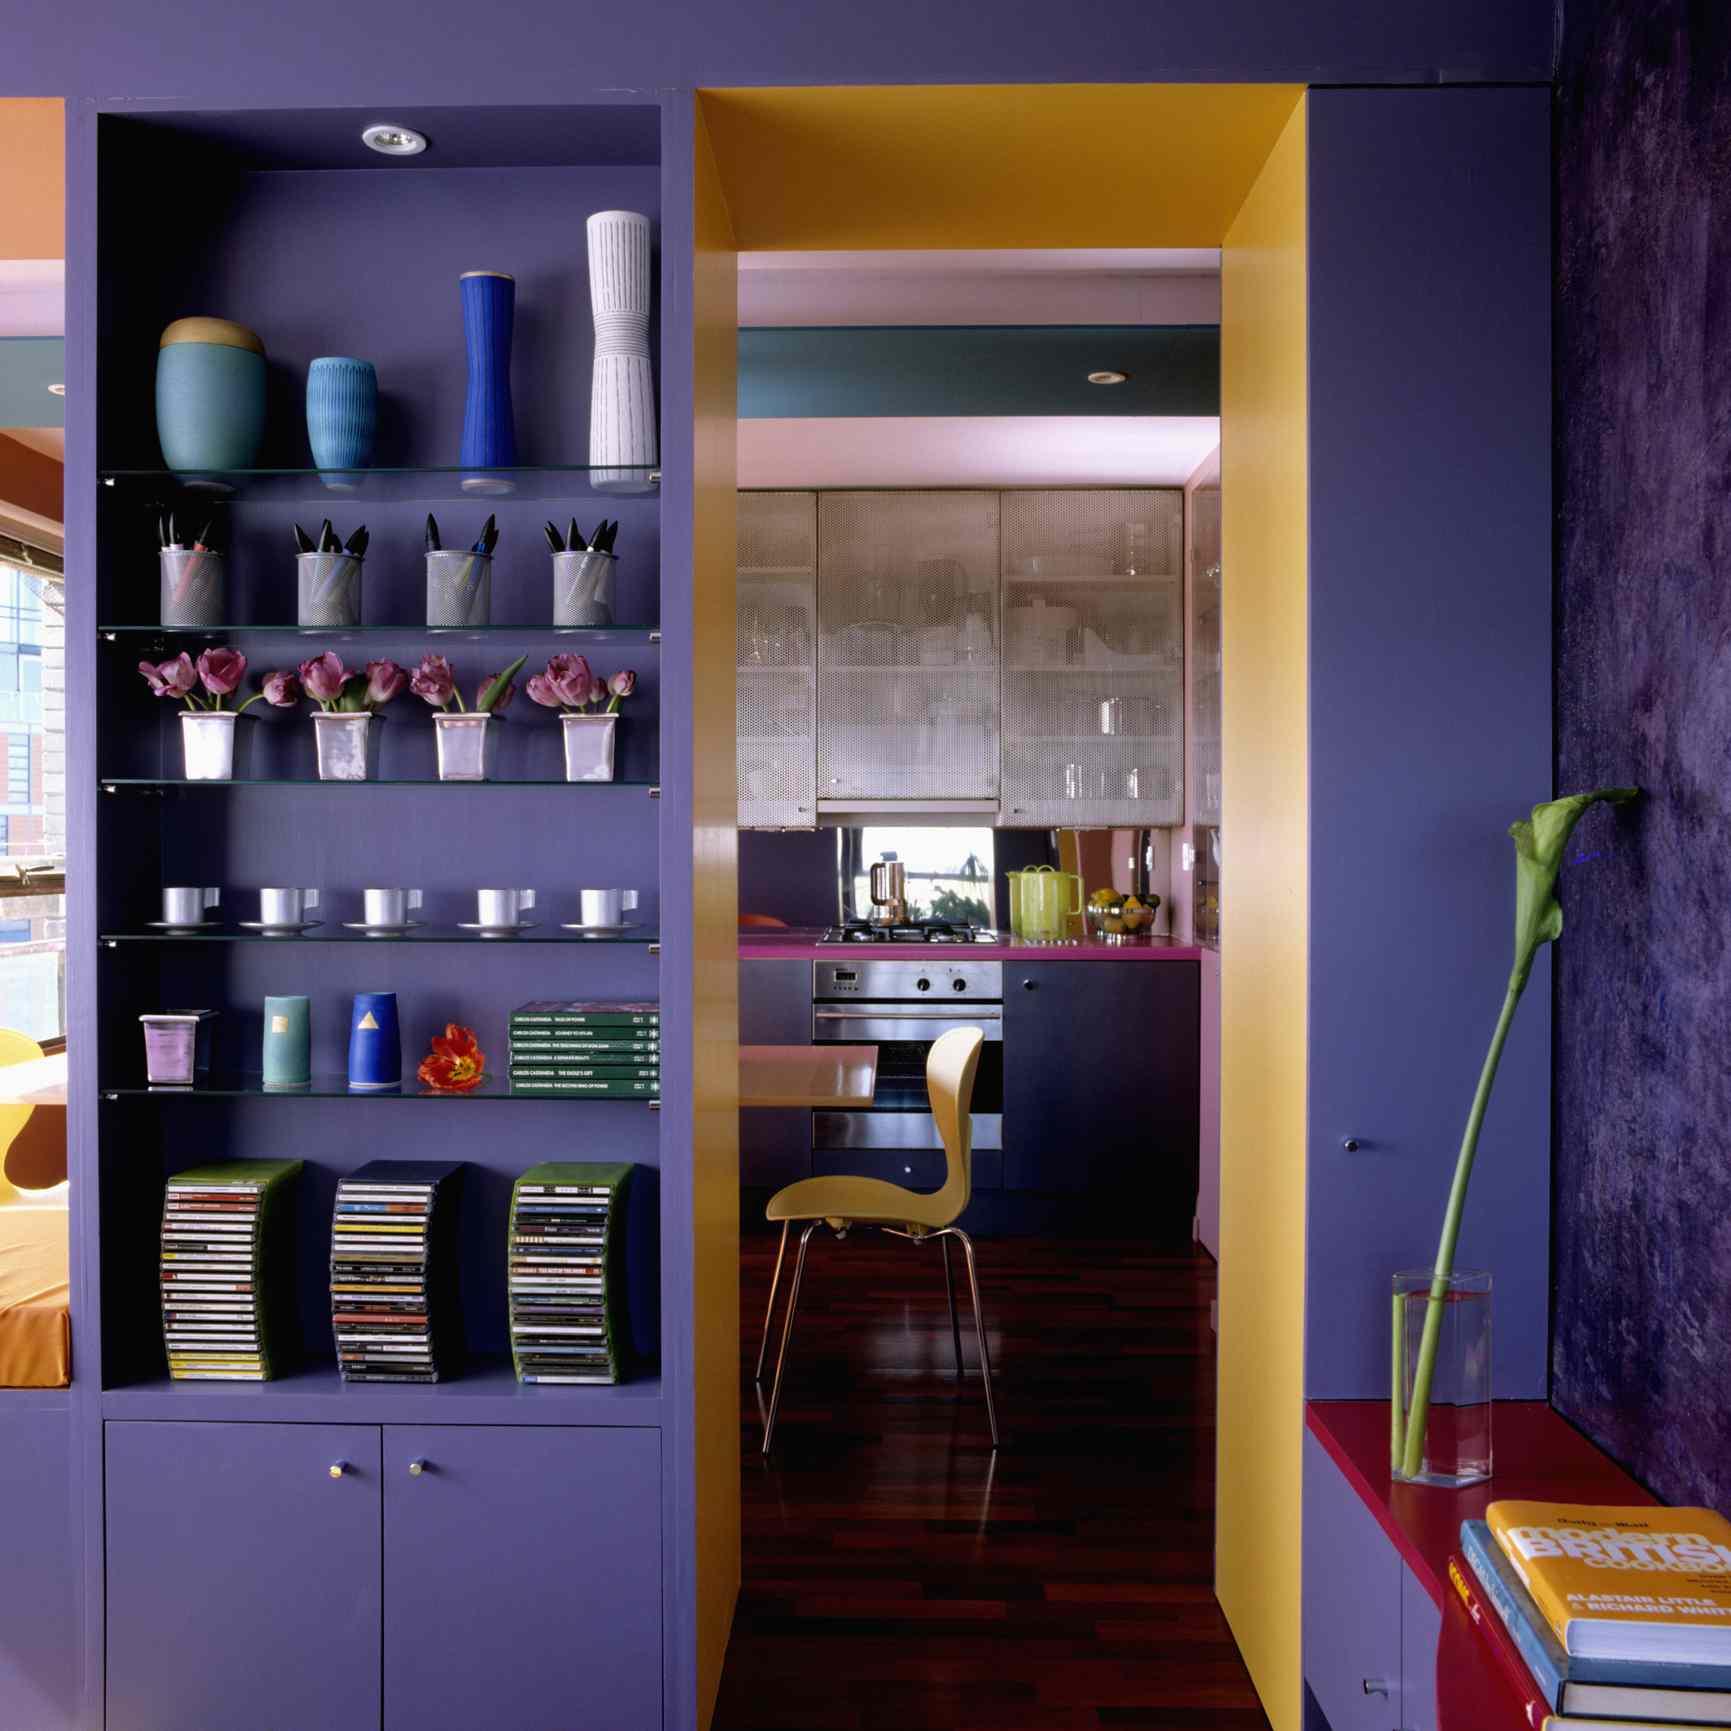 Yellow and purple room